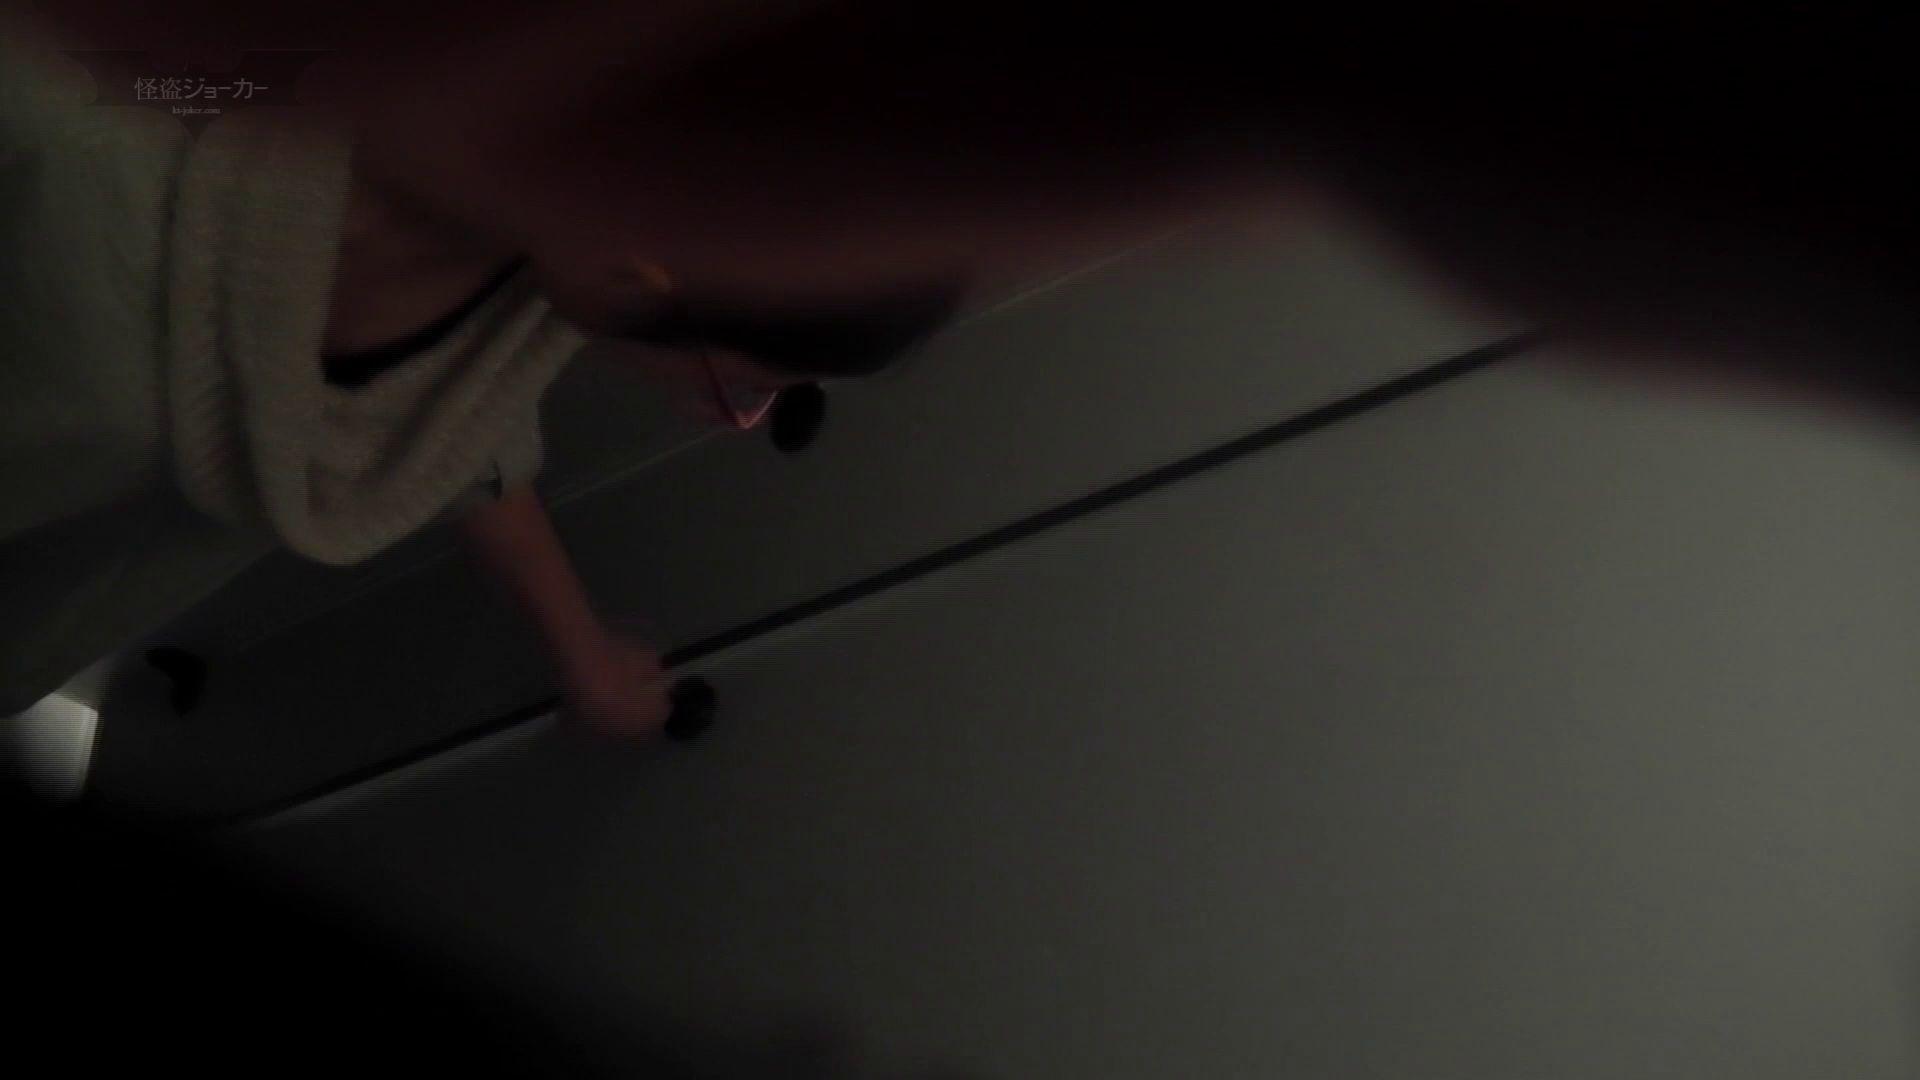 潜入!!台湾名門女学院 Vol.10 進化 高画質 すけべAV動画紹介 89枚 6